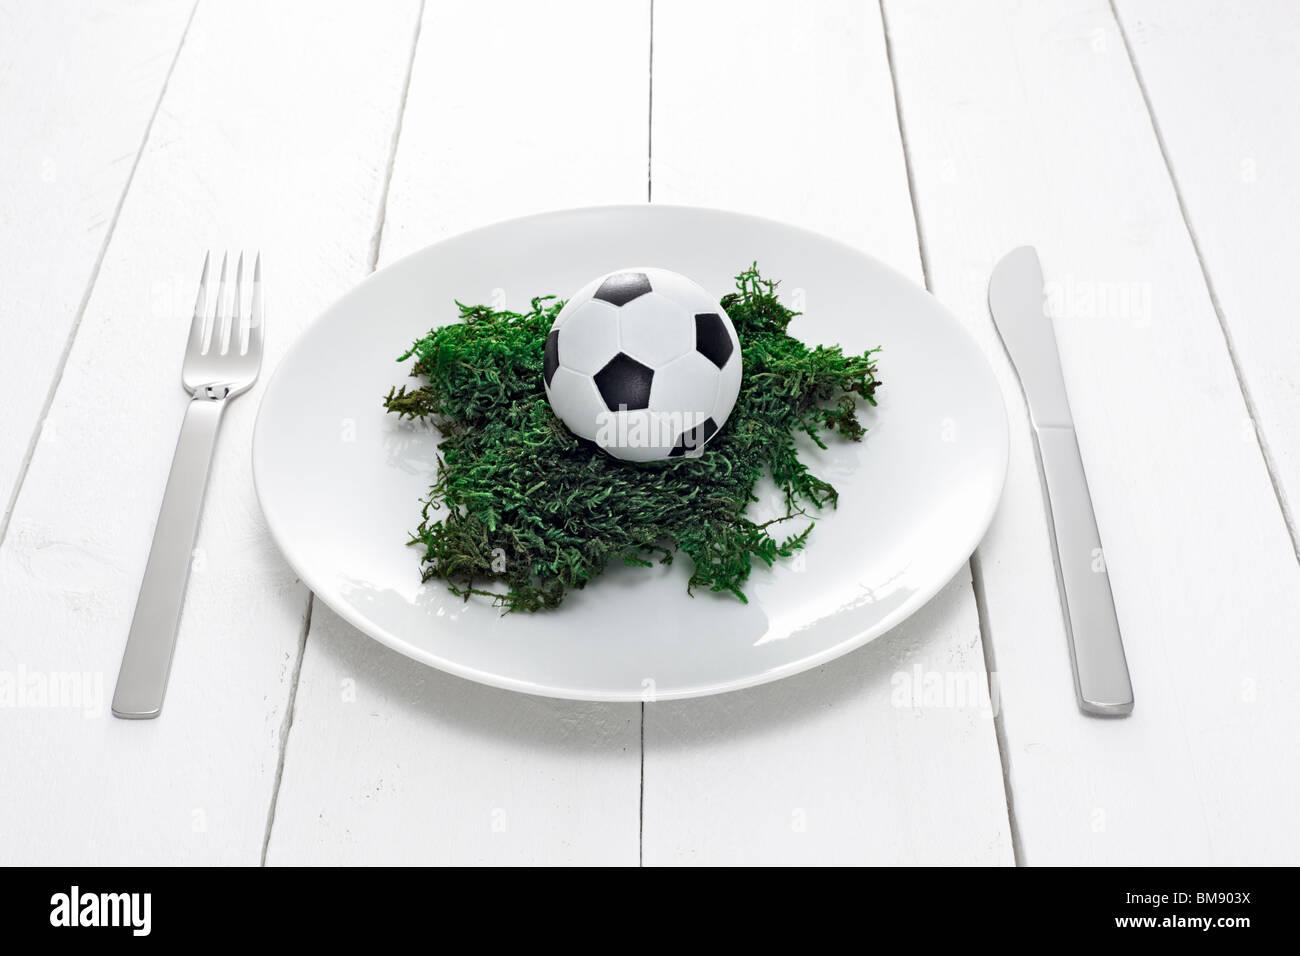 Teller mit Minifussball auf Moos - Stock Image